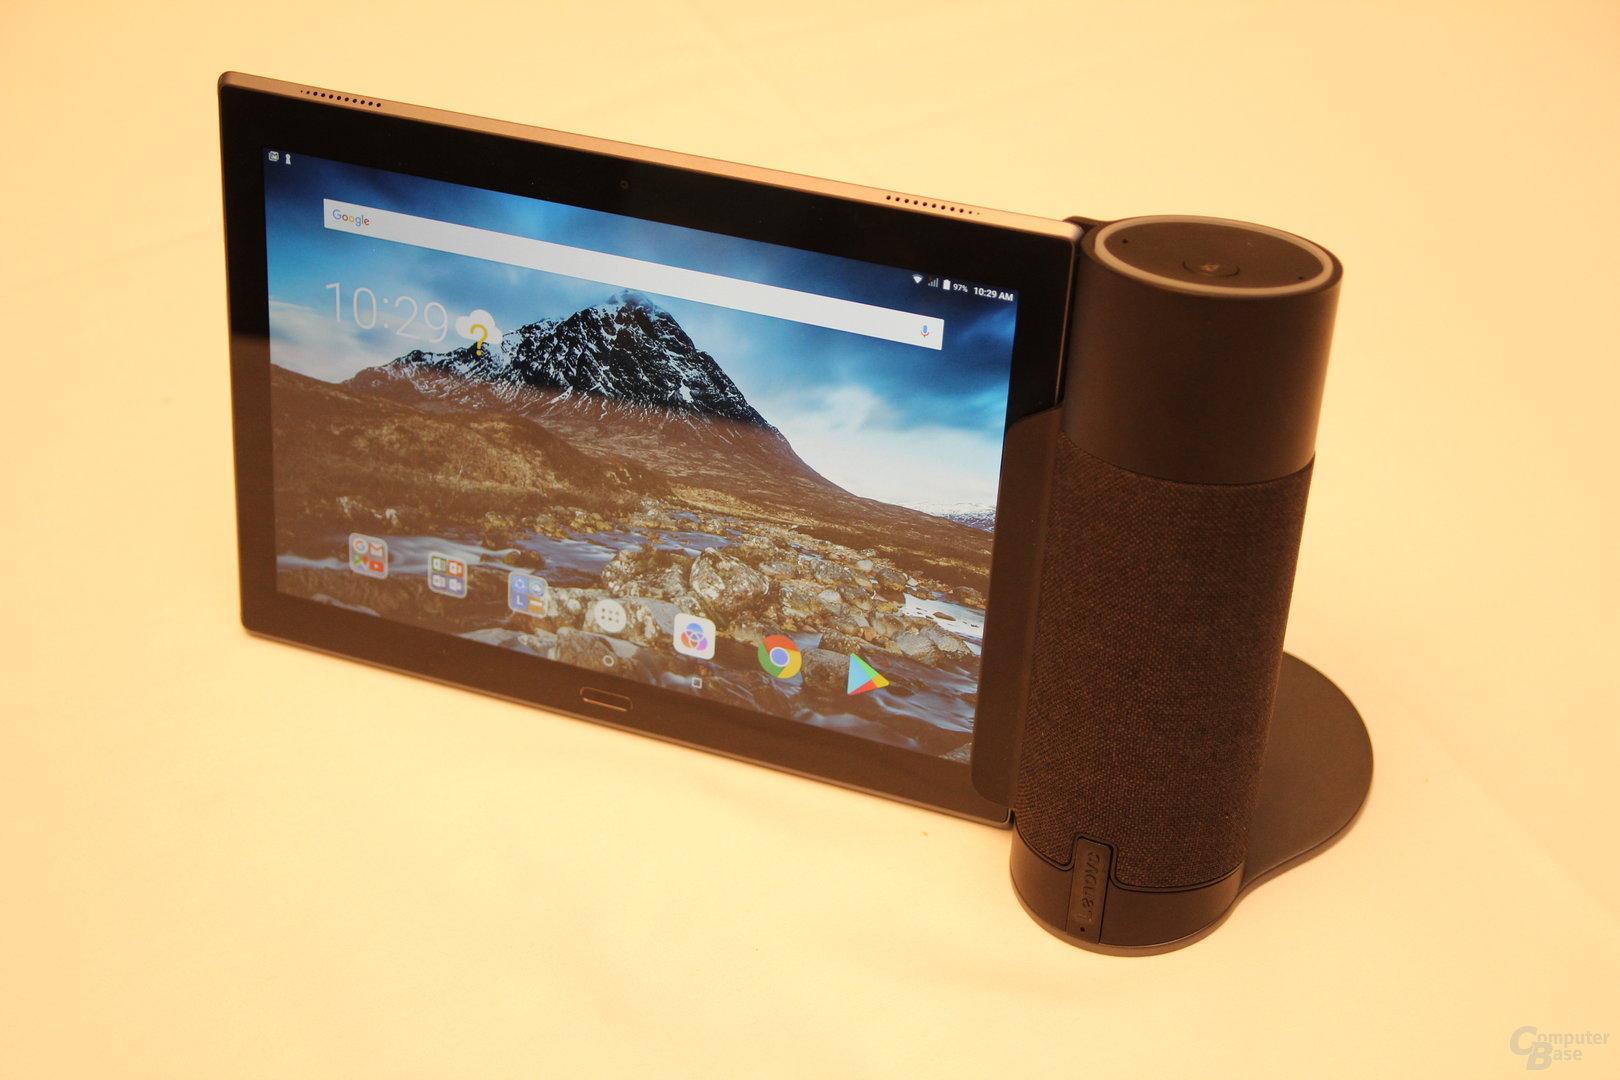 Lenovo Tab 4 mit Alexa Home Assistant